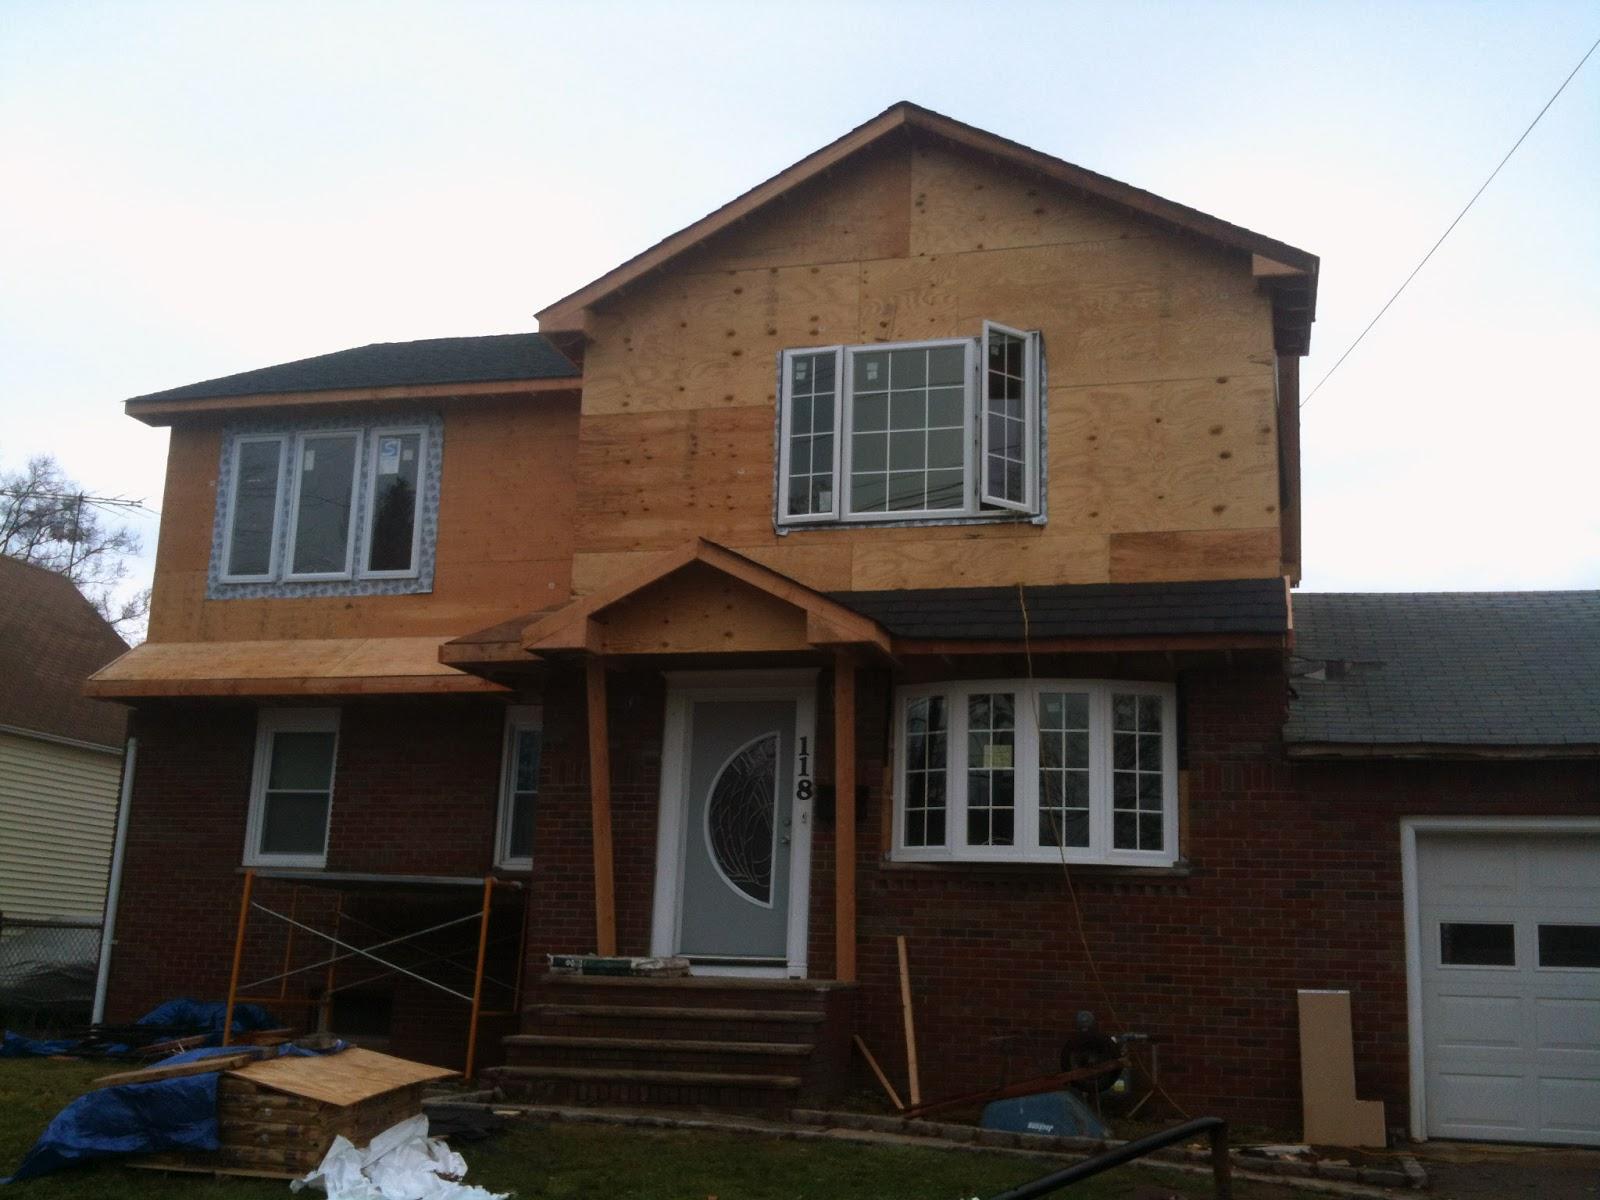 Under Construction: Second Floor Addition in Clark, NJ